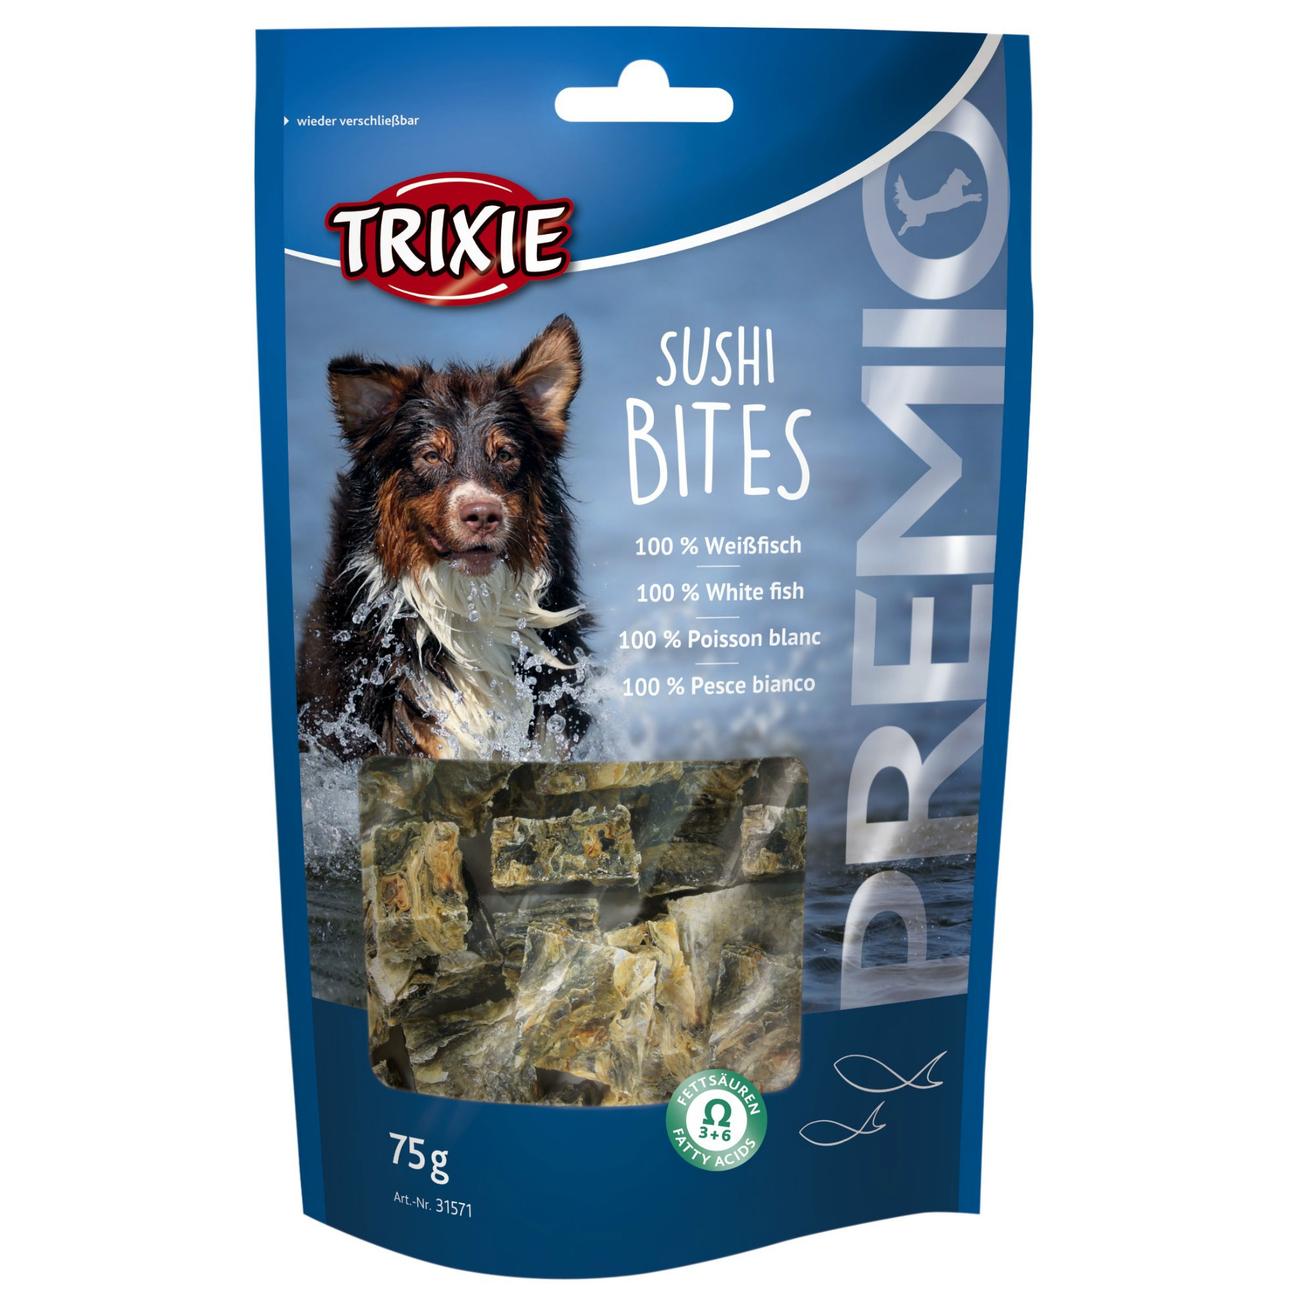 TRIXIE Sushi Bites Hunde Leckerlies 31571